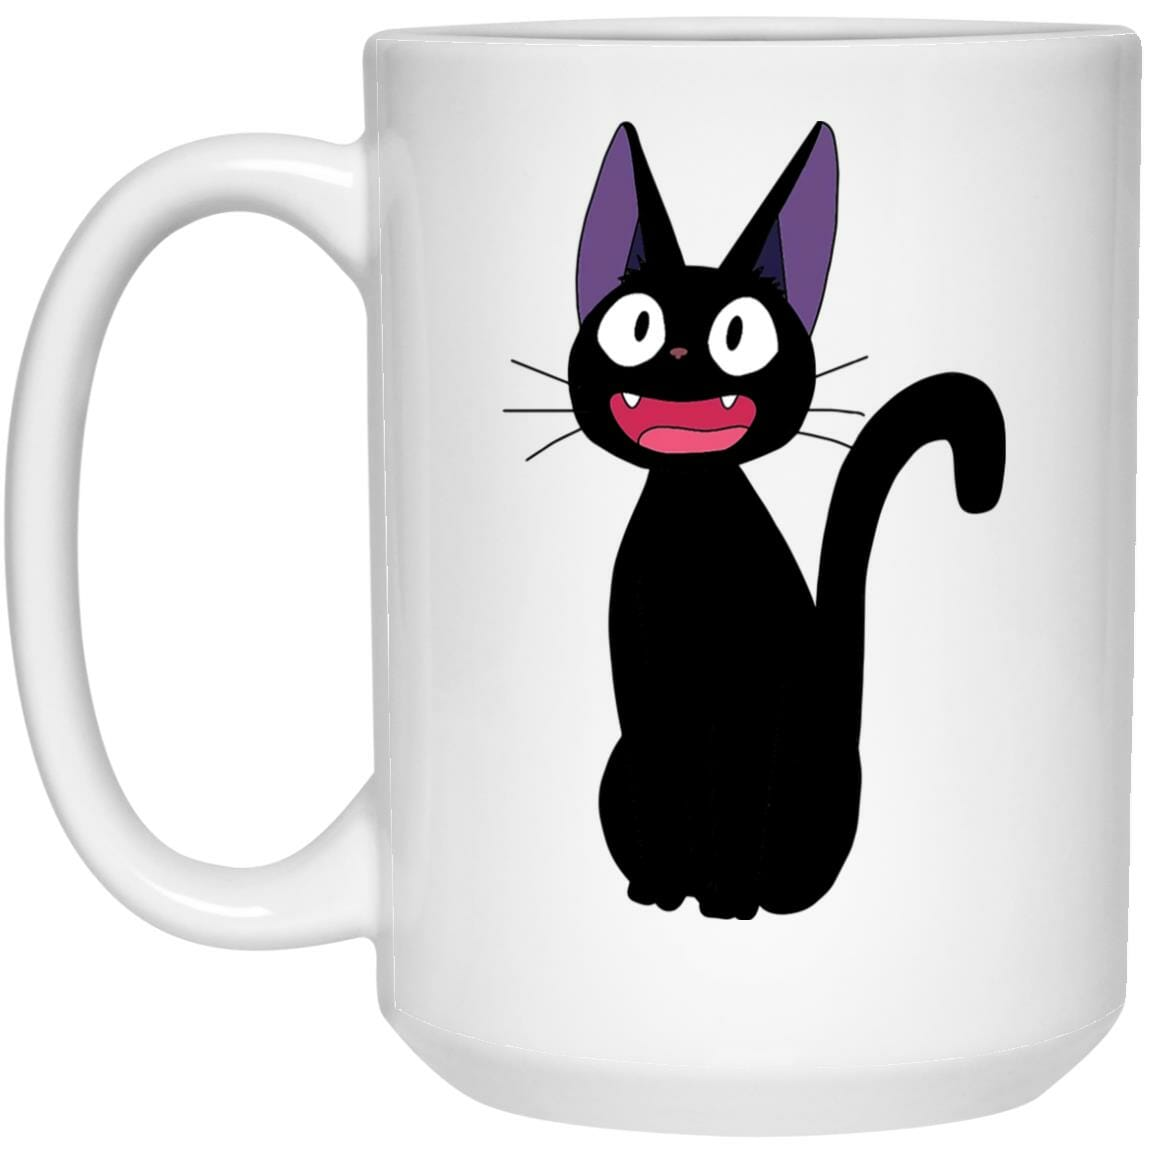 Kiki's Delivery Service  – Jiji Style 2 Mug